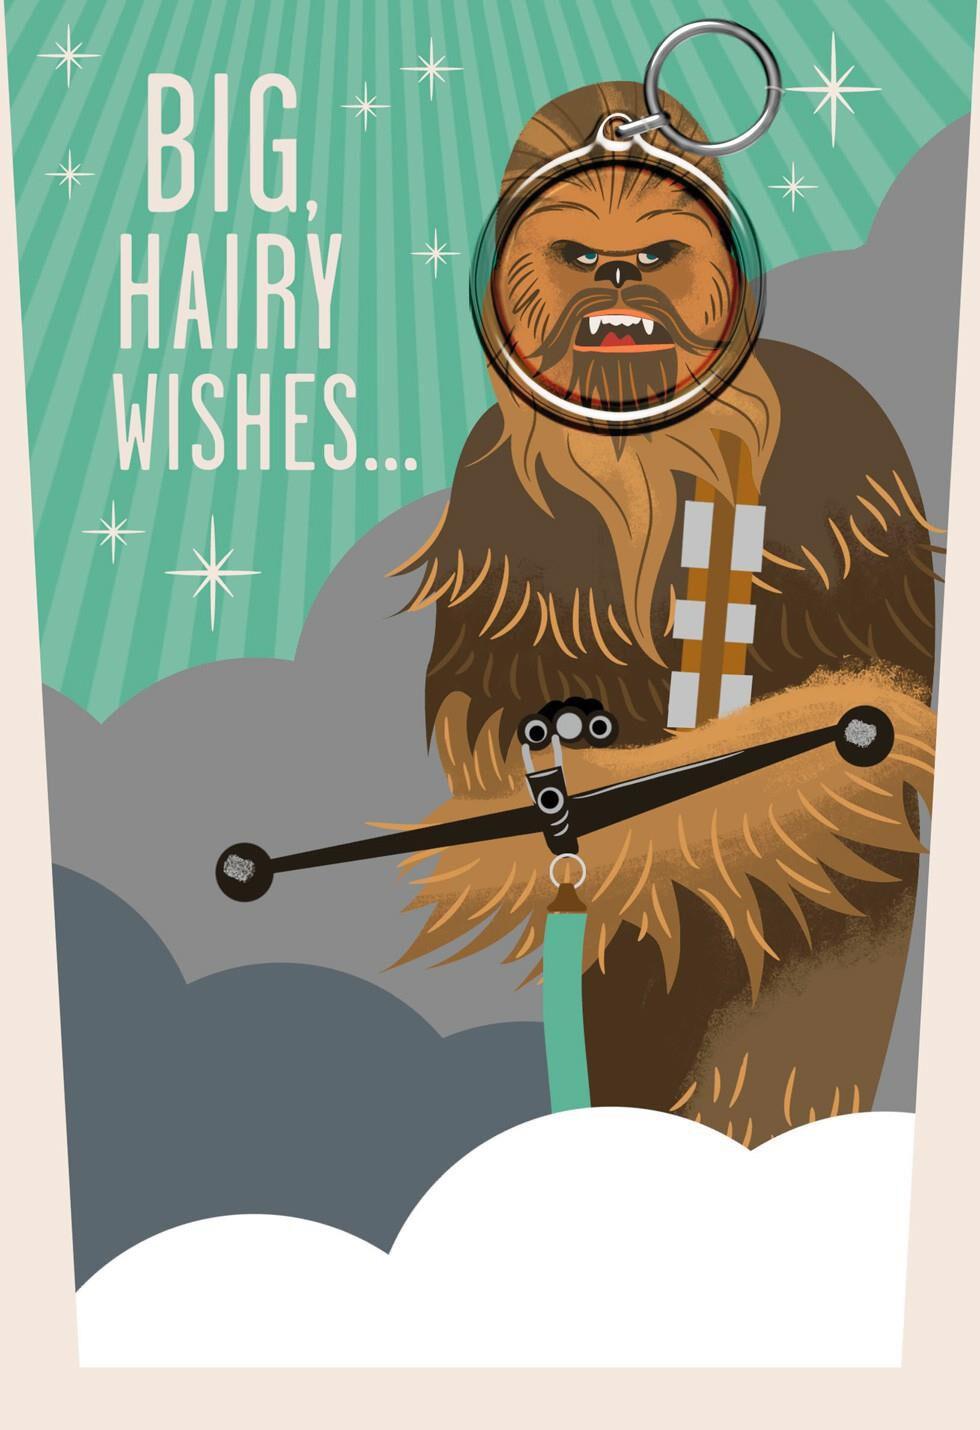 Star Wars Chewbacca Fathers Day Card With Keychain Greeting – Chewbacca Birthday Card